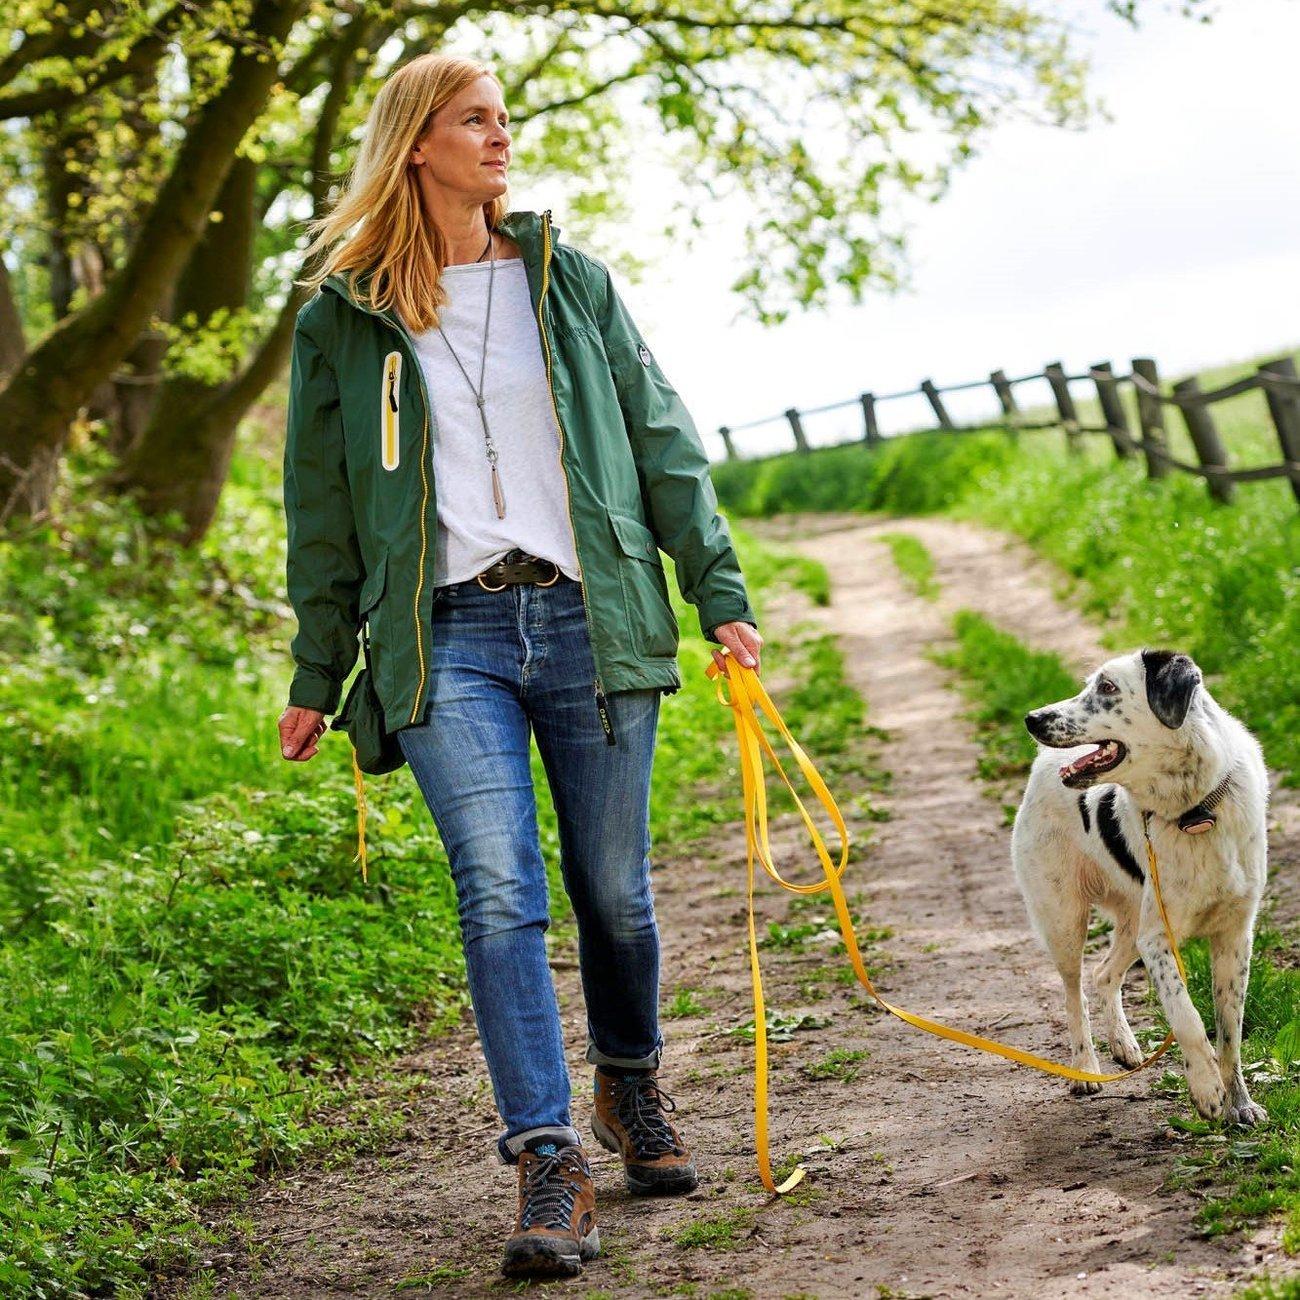 Hundesport Unisex Jacke Trusty Friend Bild 10